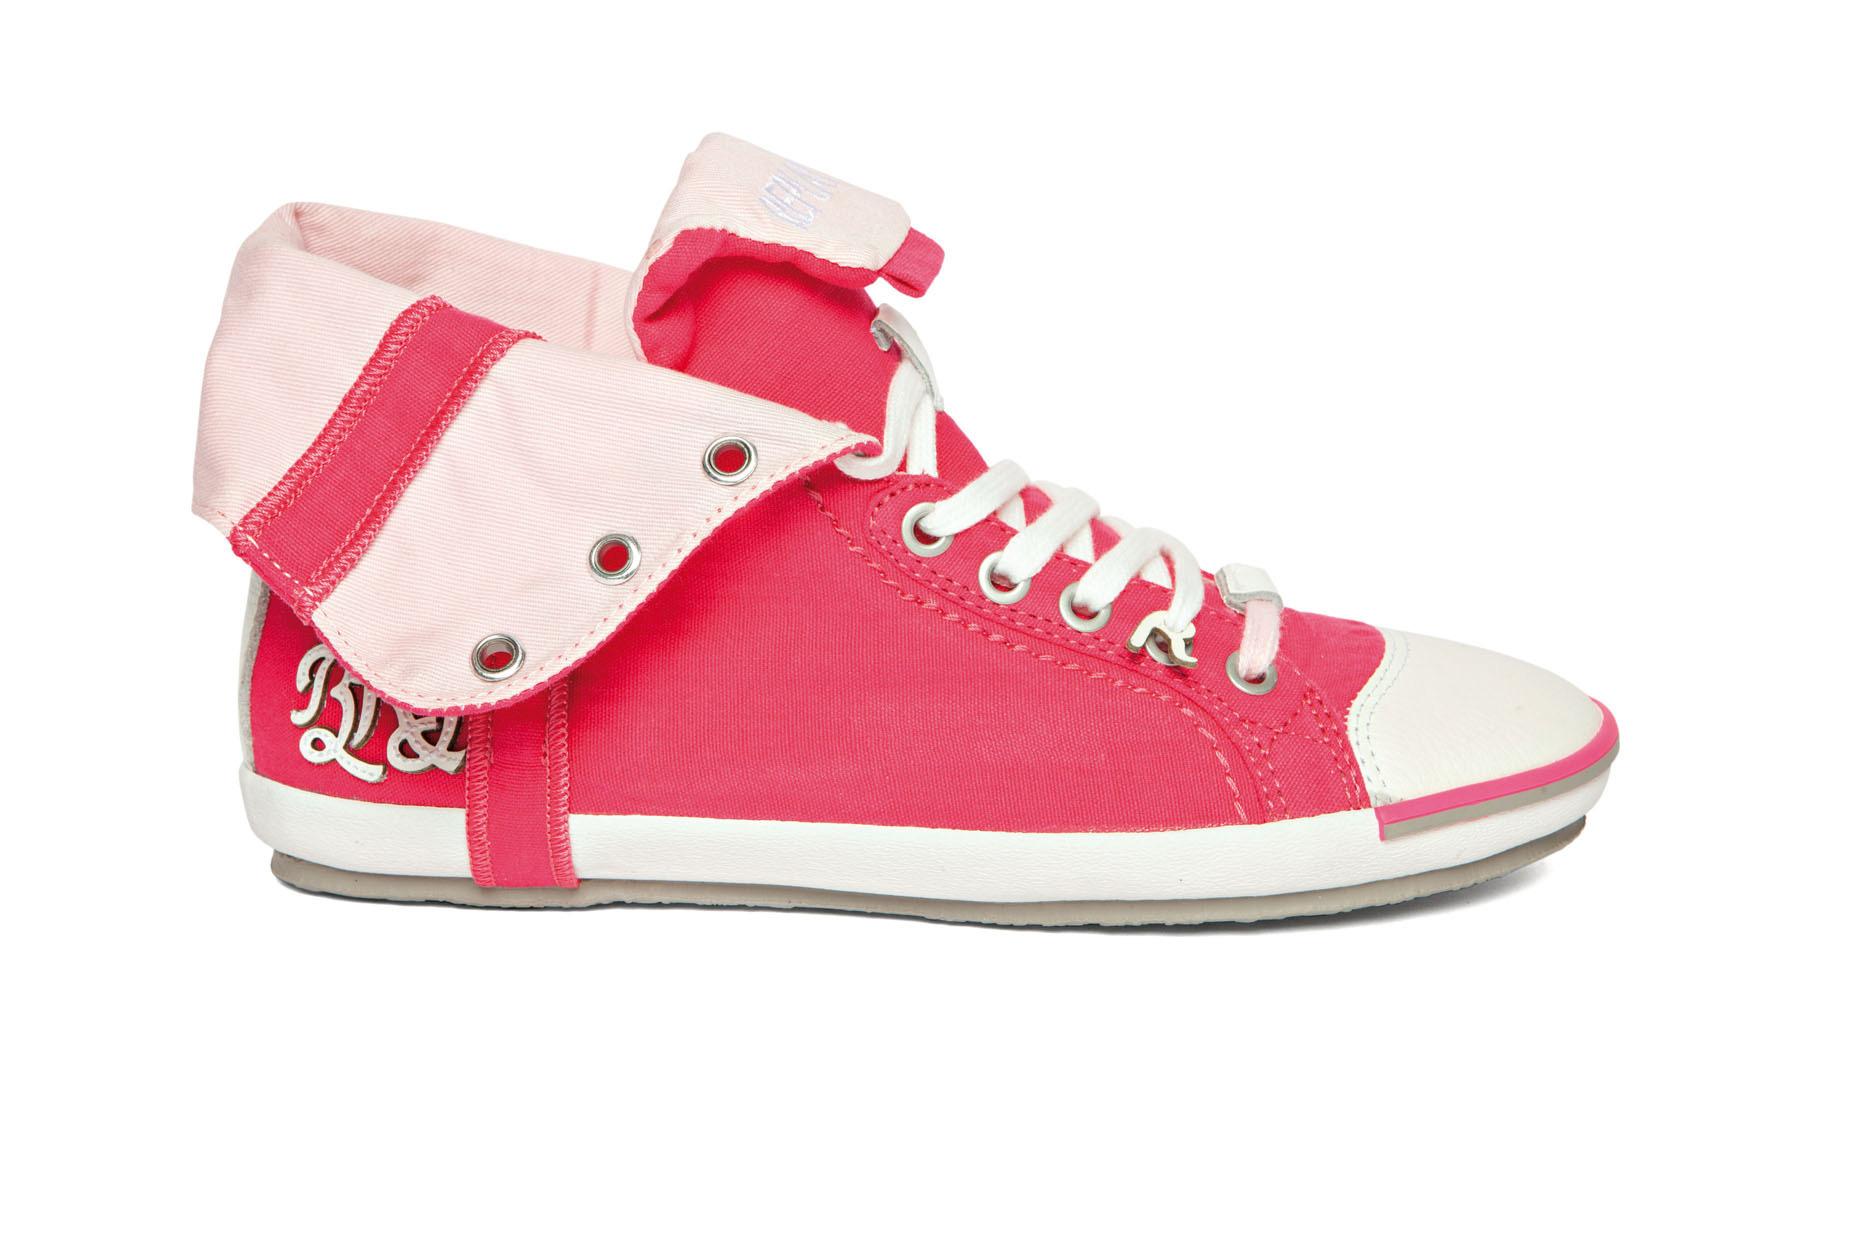 Replay Tornacipő - Starlette - rv140049t-0025 - Office Shoes ... 2e1f163c72